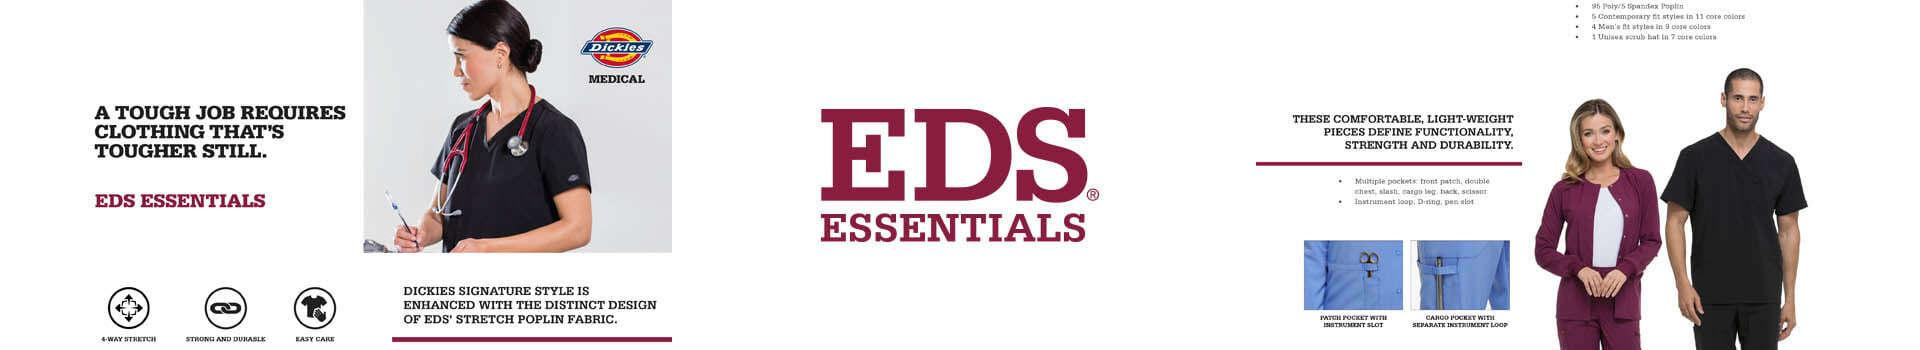 EDS Essentials